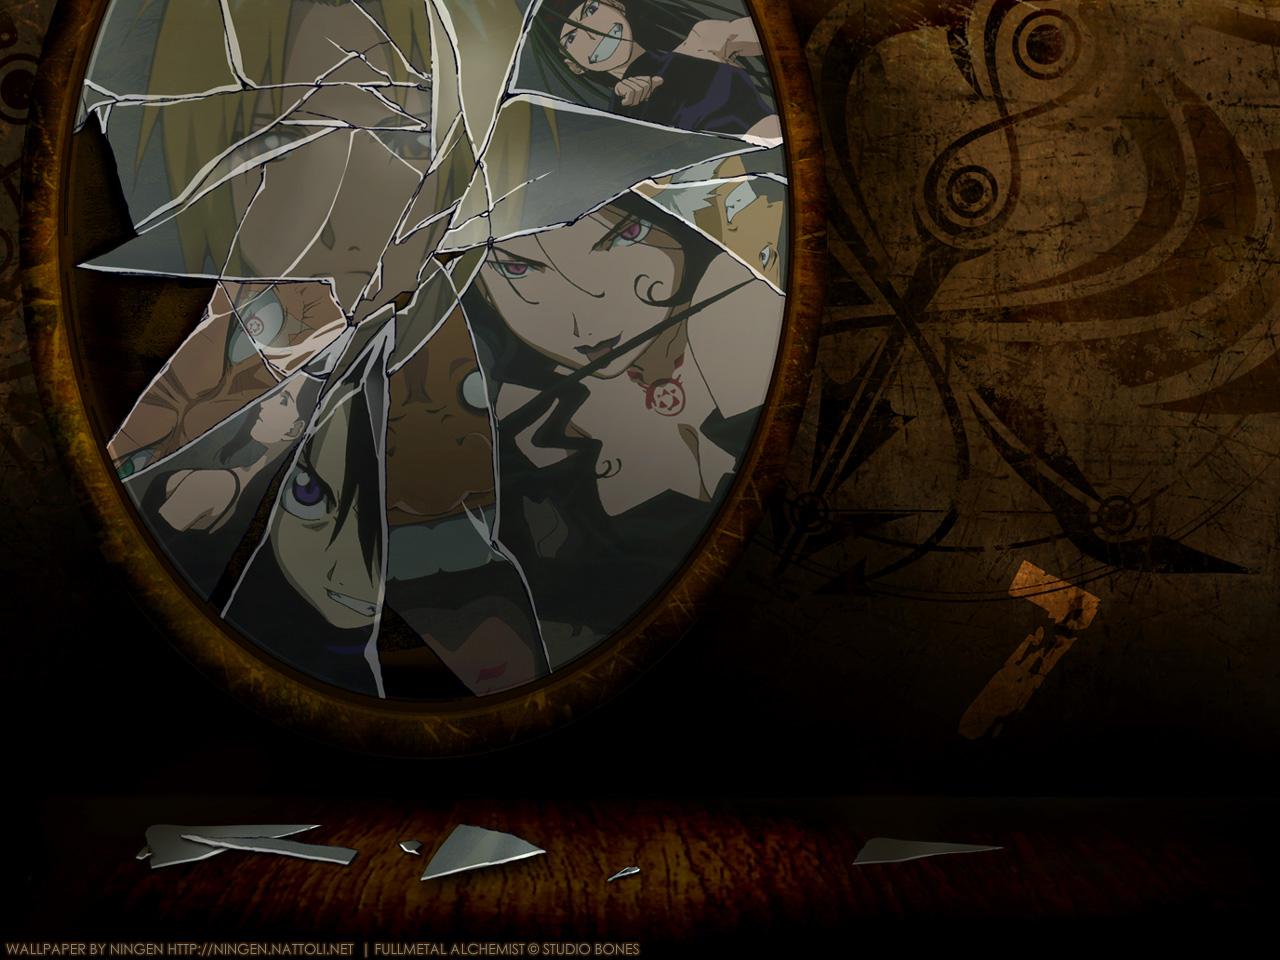 Fullmetal Alchemist Sad Breakup Sad Whatsapp Status